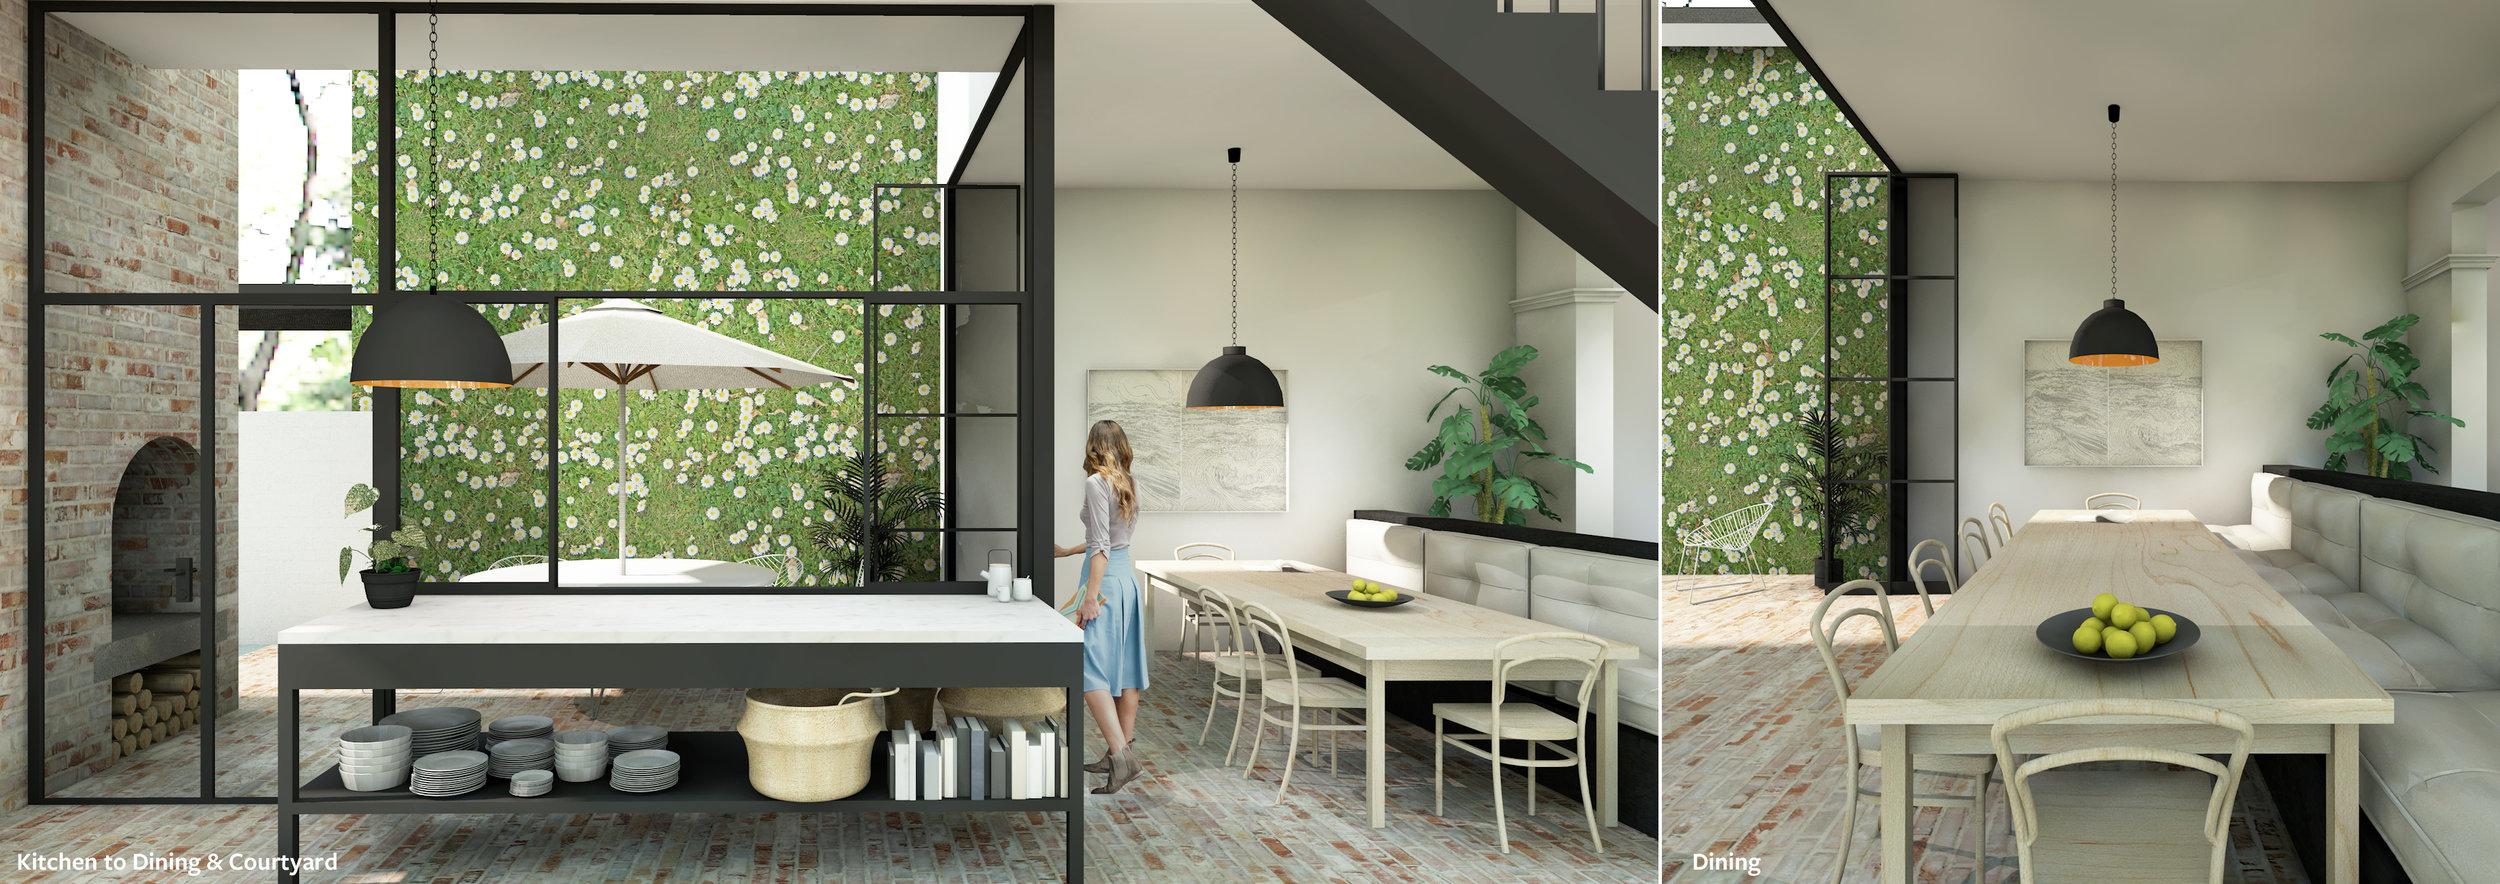 Internal Courtyard House Built in dining Olivia van Dijk Architecture.jpg